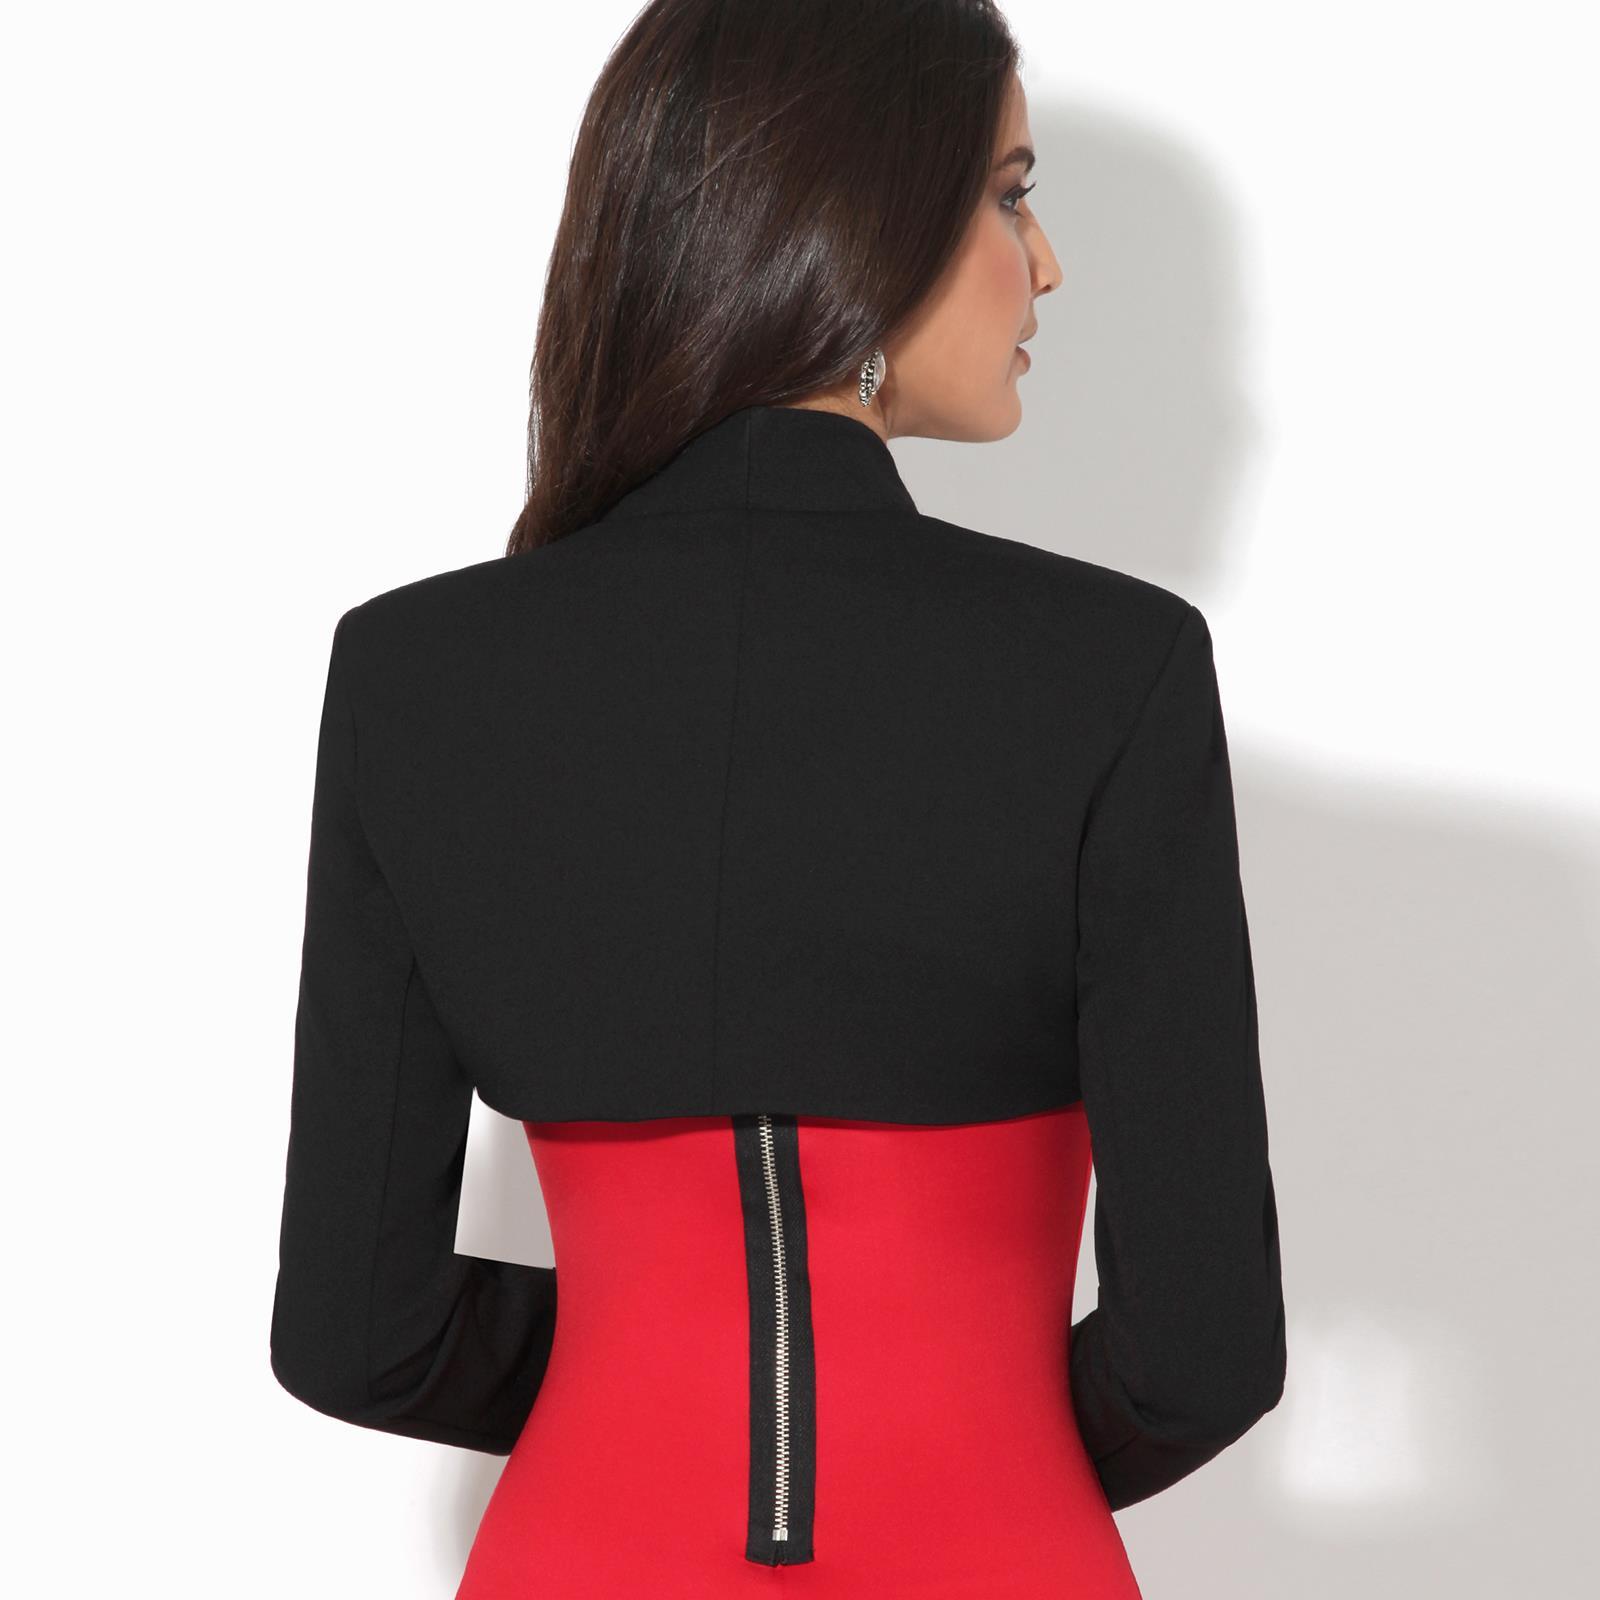 Womens-Ladies-Bolero-Jacket-Shrug-Chiffon-Long-Sleeve-Crop-Top-Blazer-Coat-Party thumbnail 3